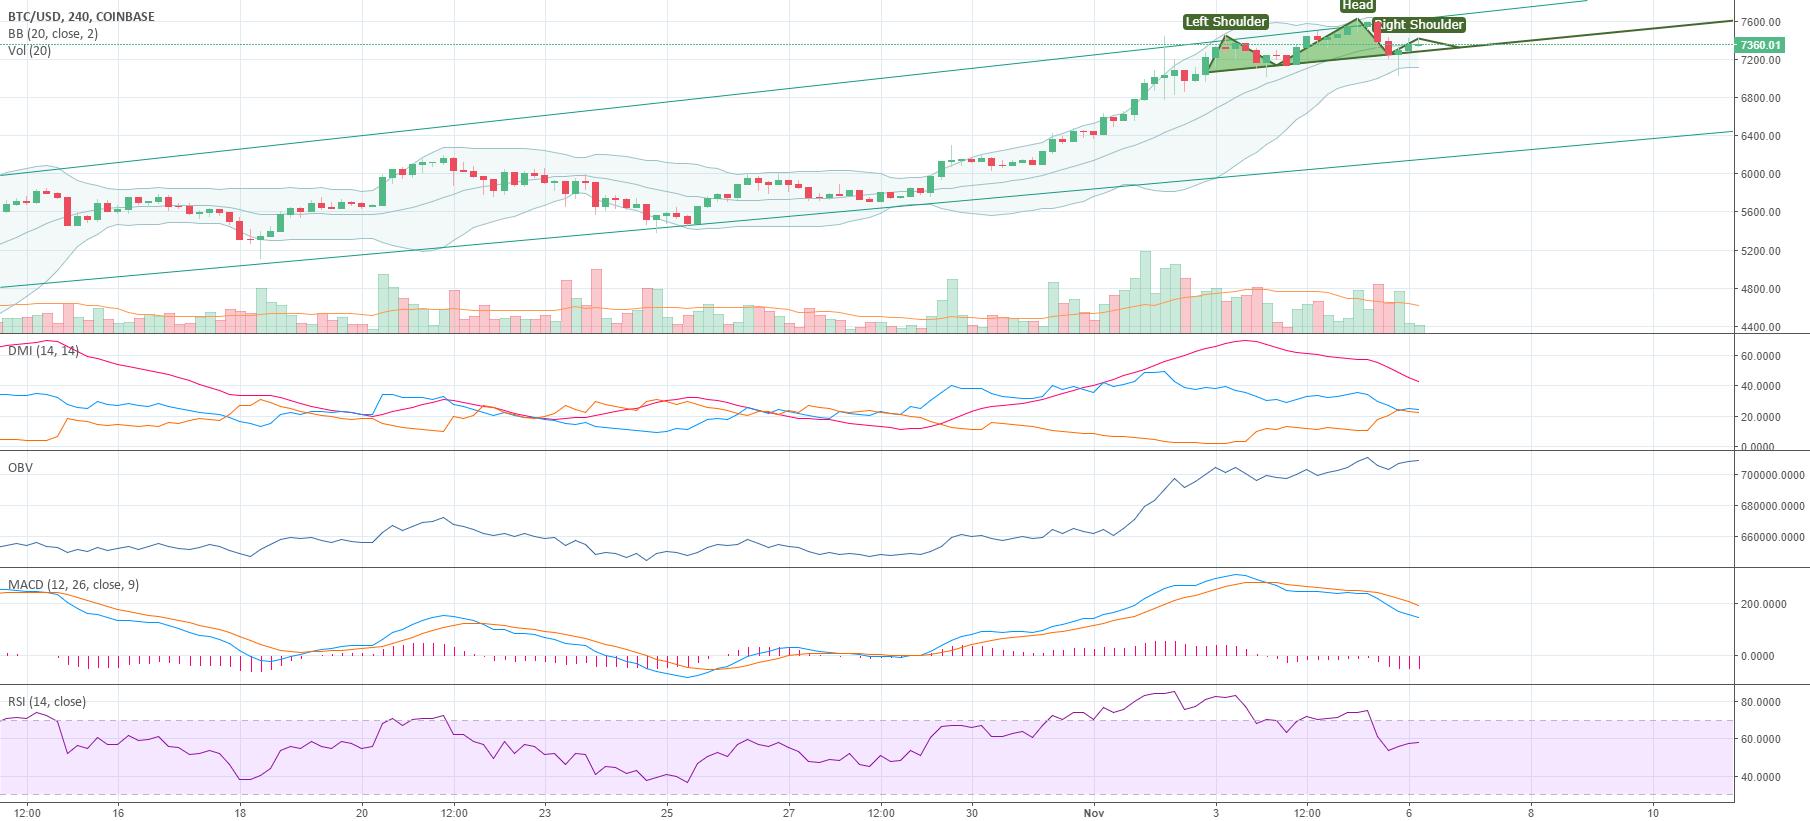 BTC/USD (Possible H&S)